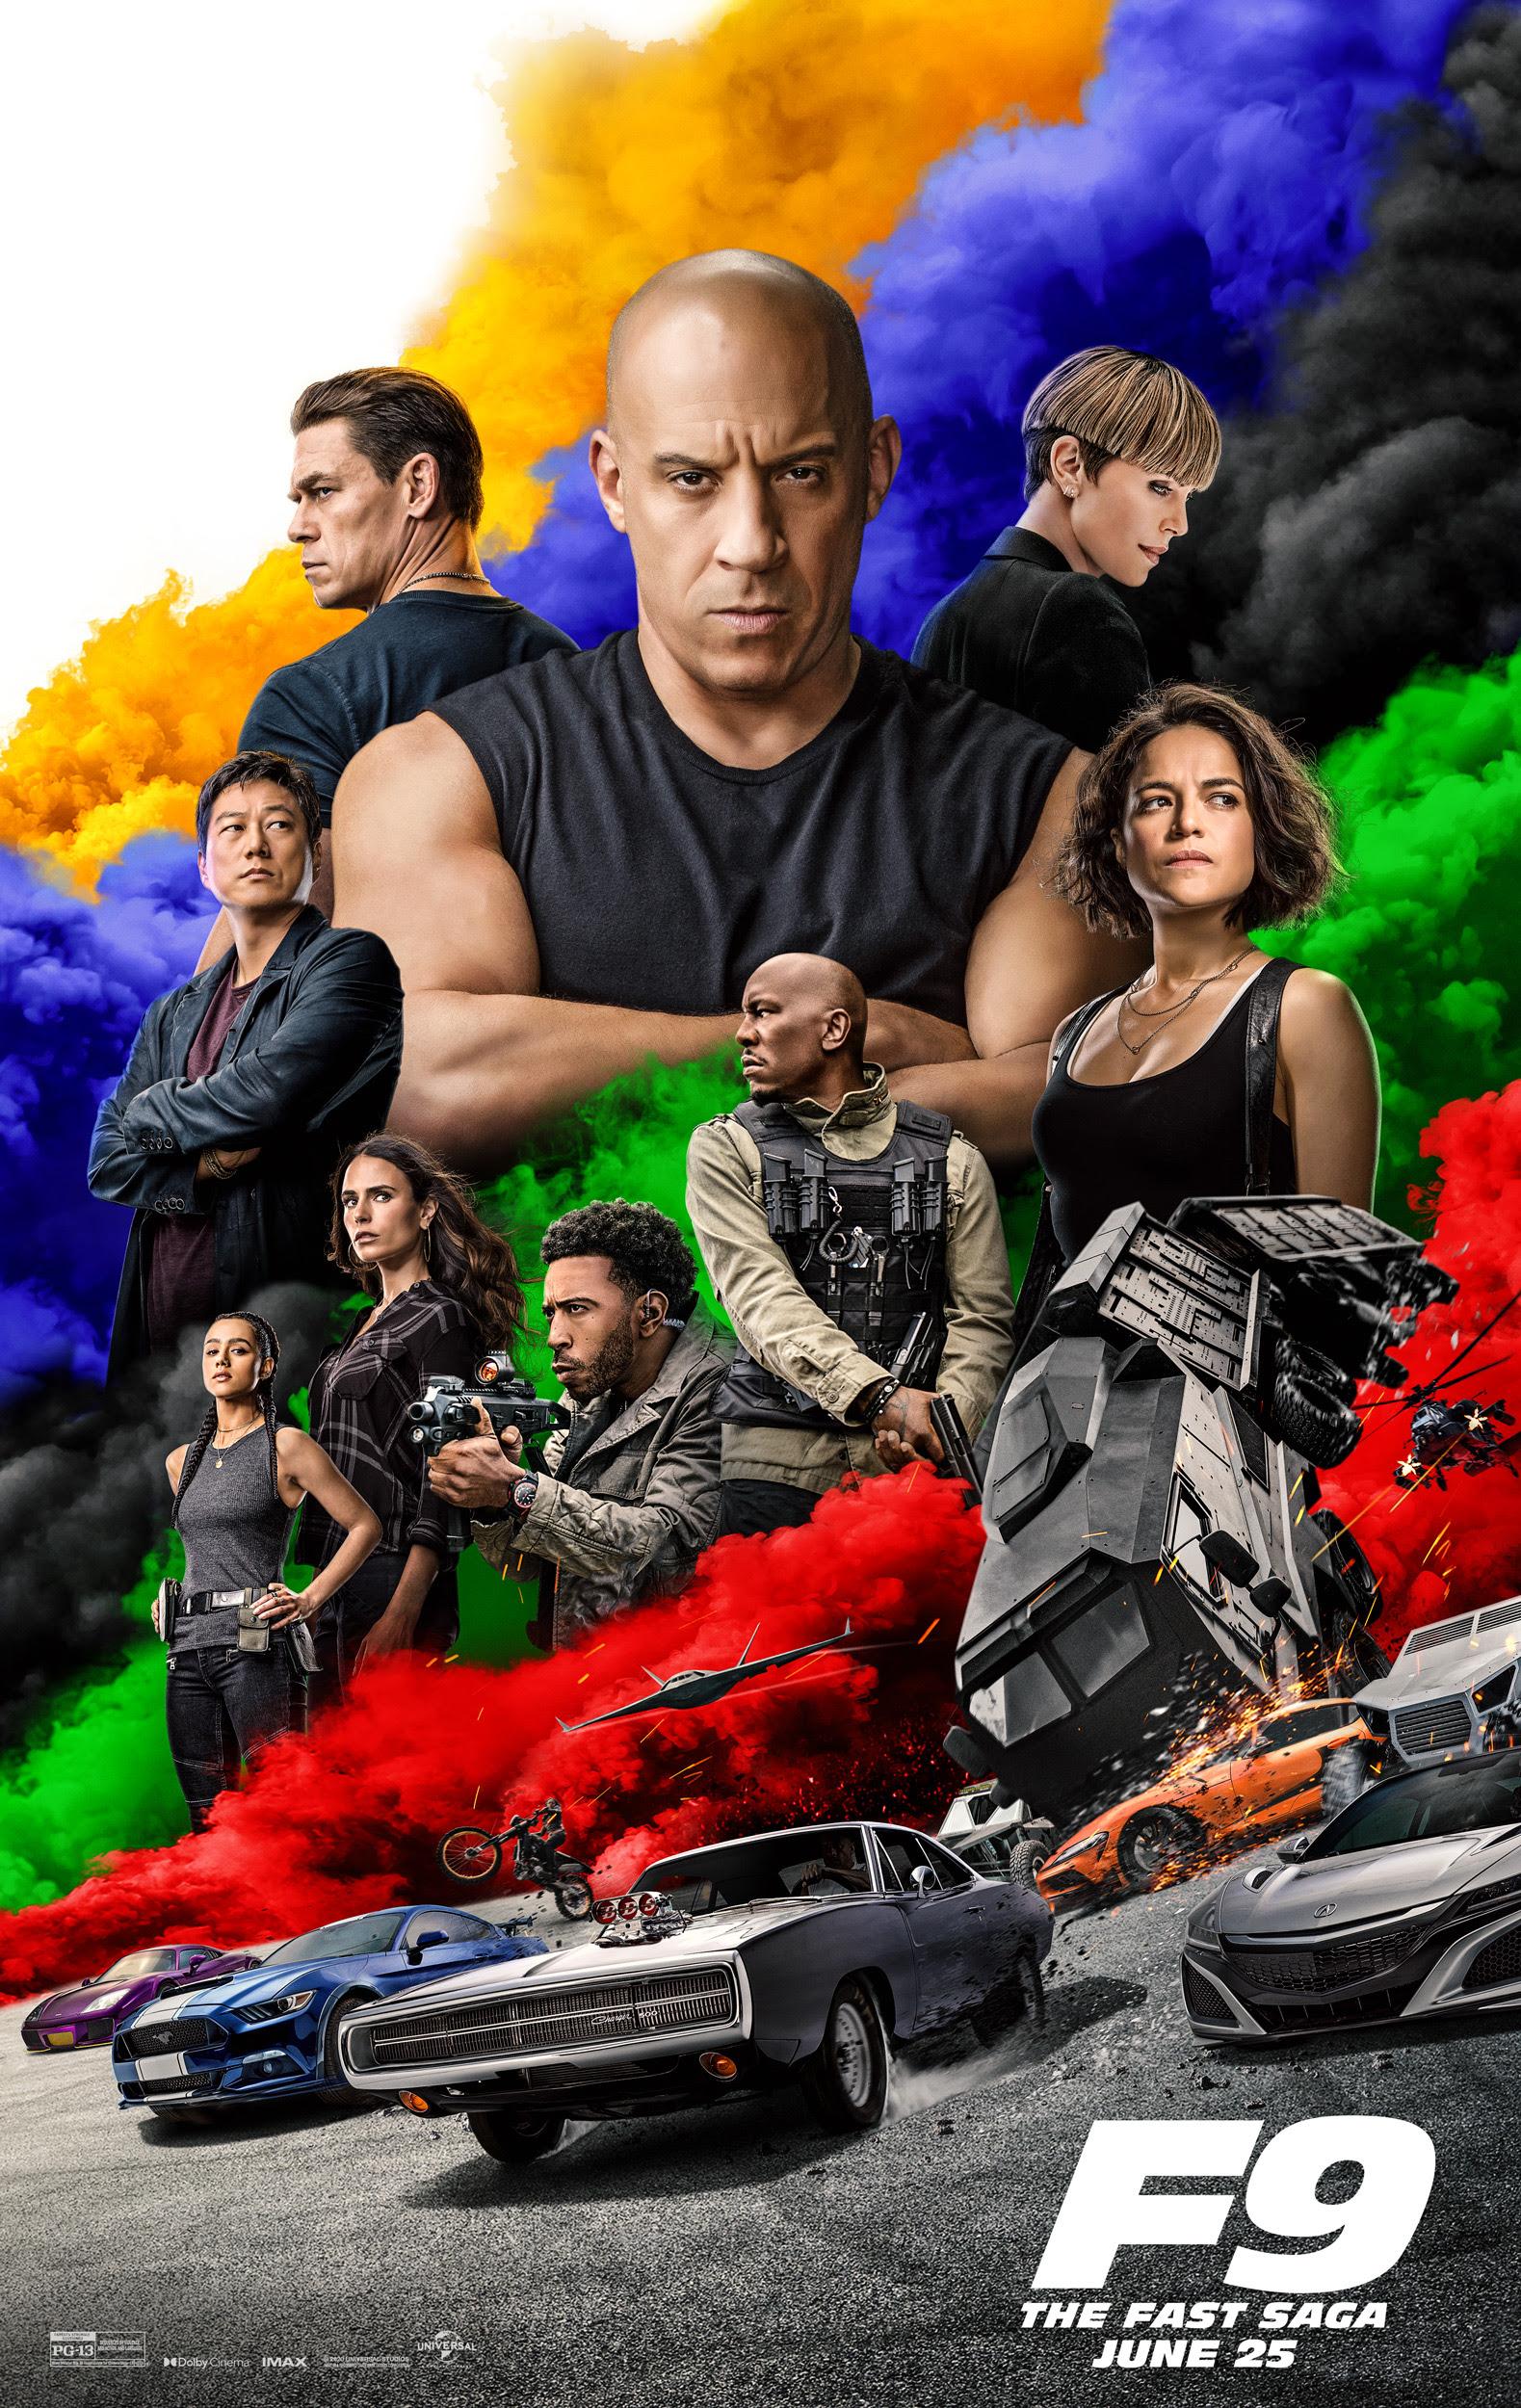 New Movie: 'F9 The Fast Saga' Starring Vin Diesel